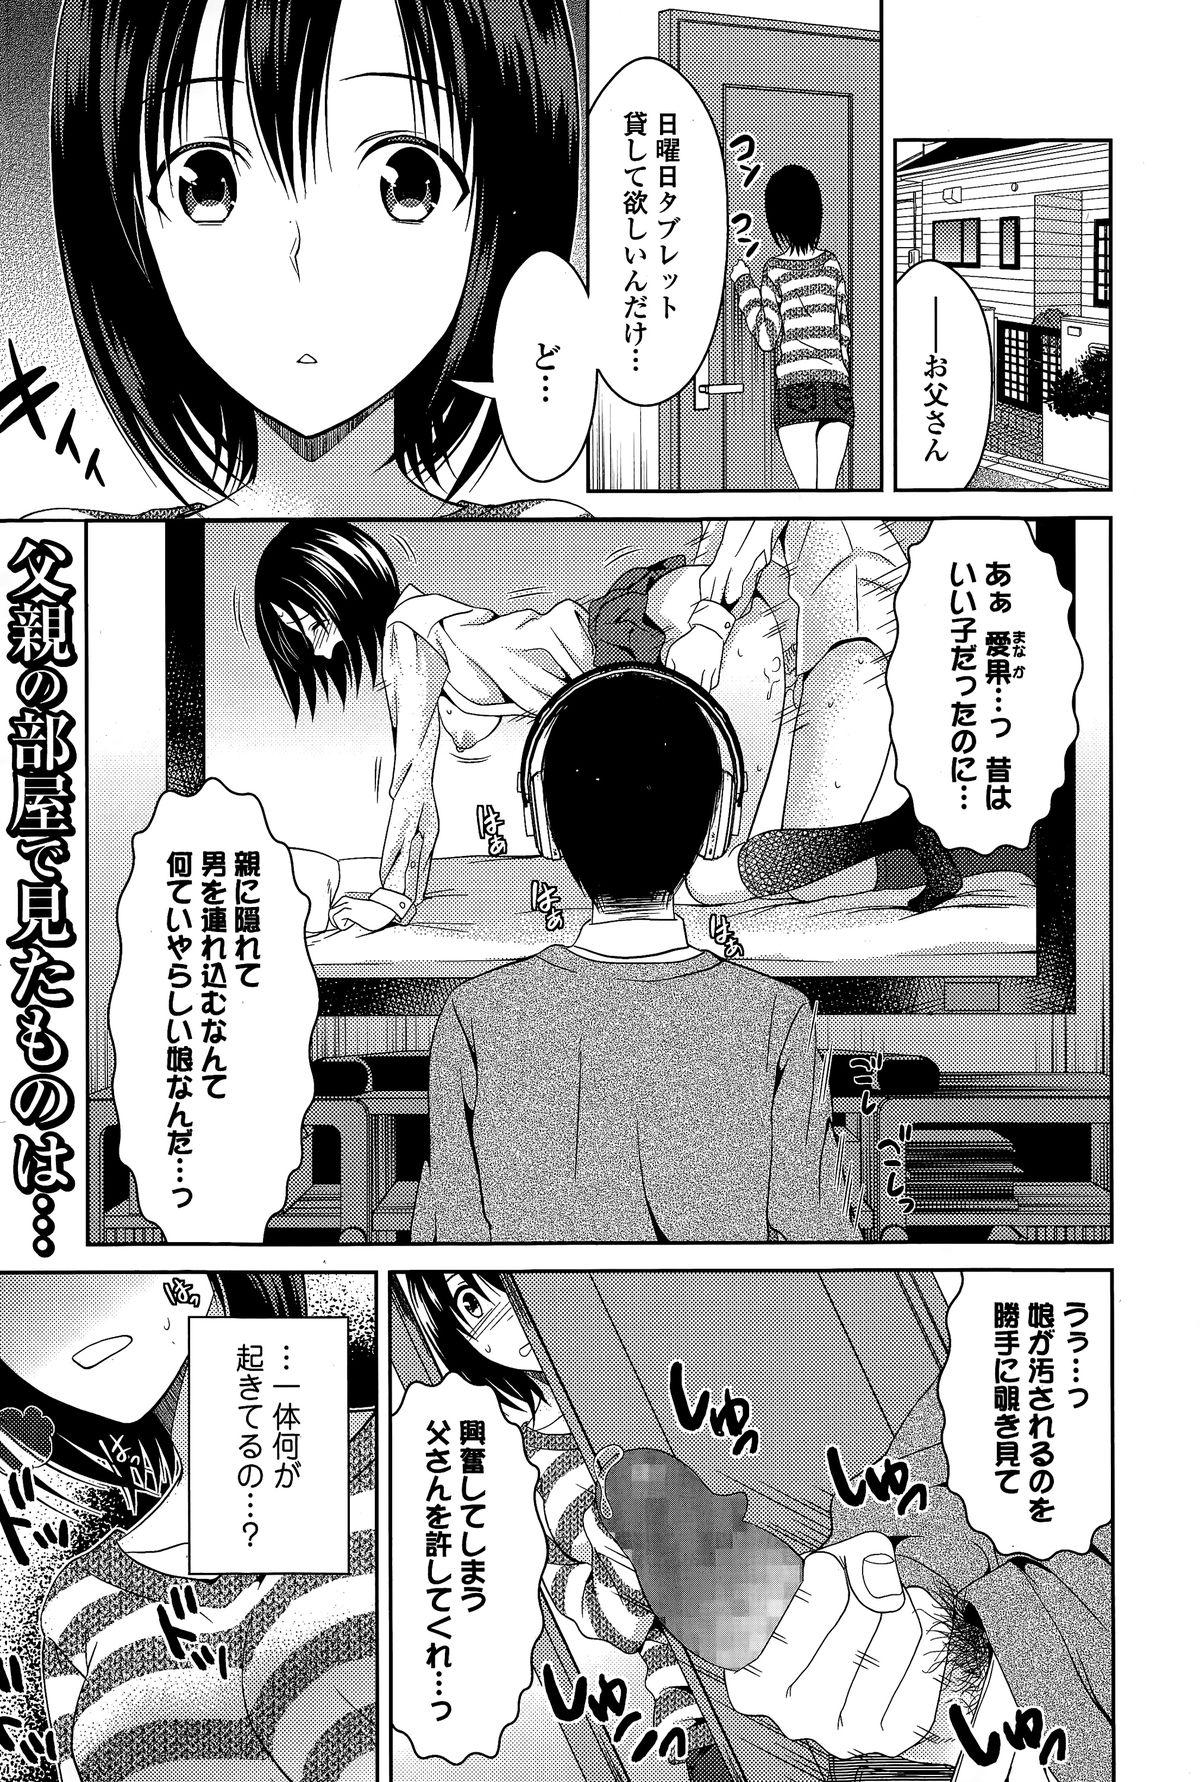 Comic Toutetsu 2015-02 Vol. 3 140